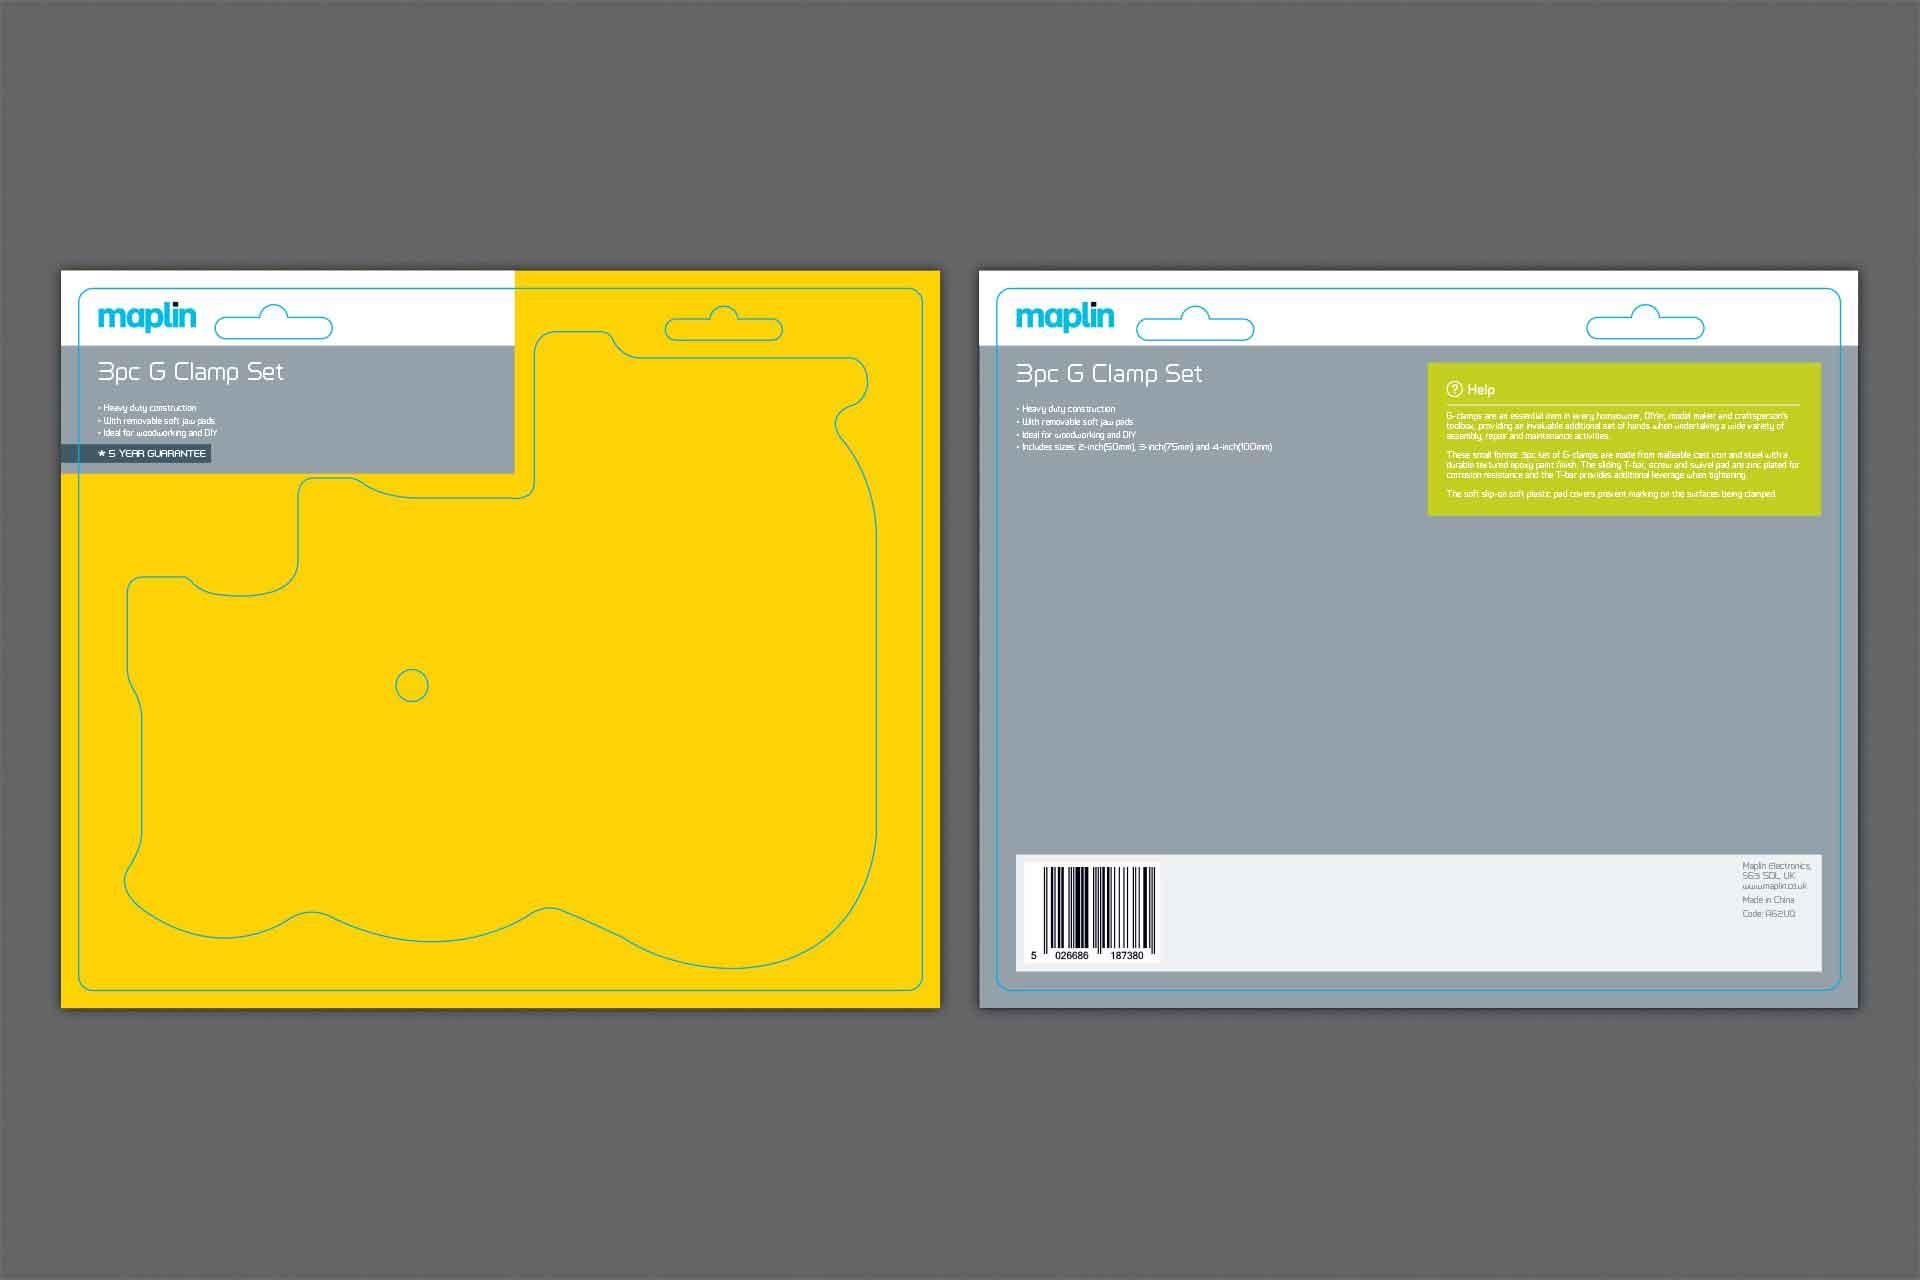 Maplin's brand identity